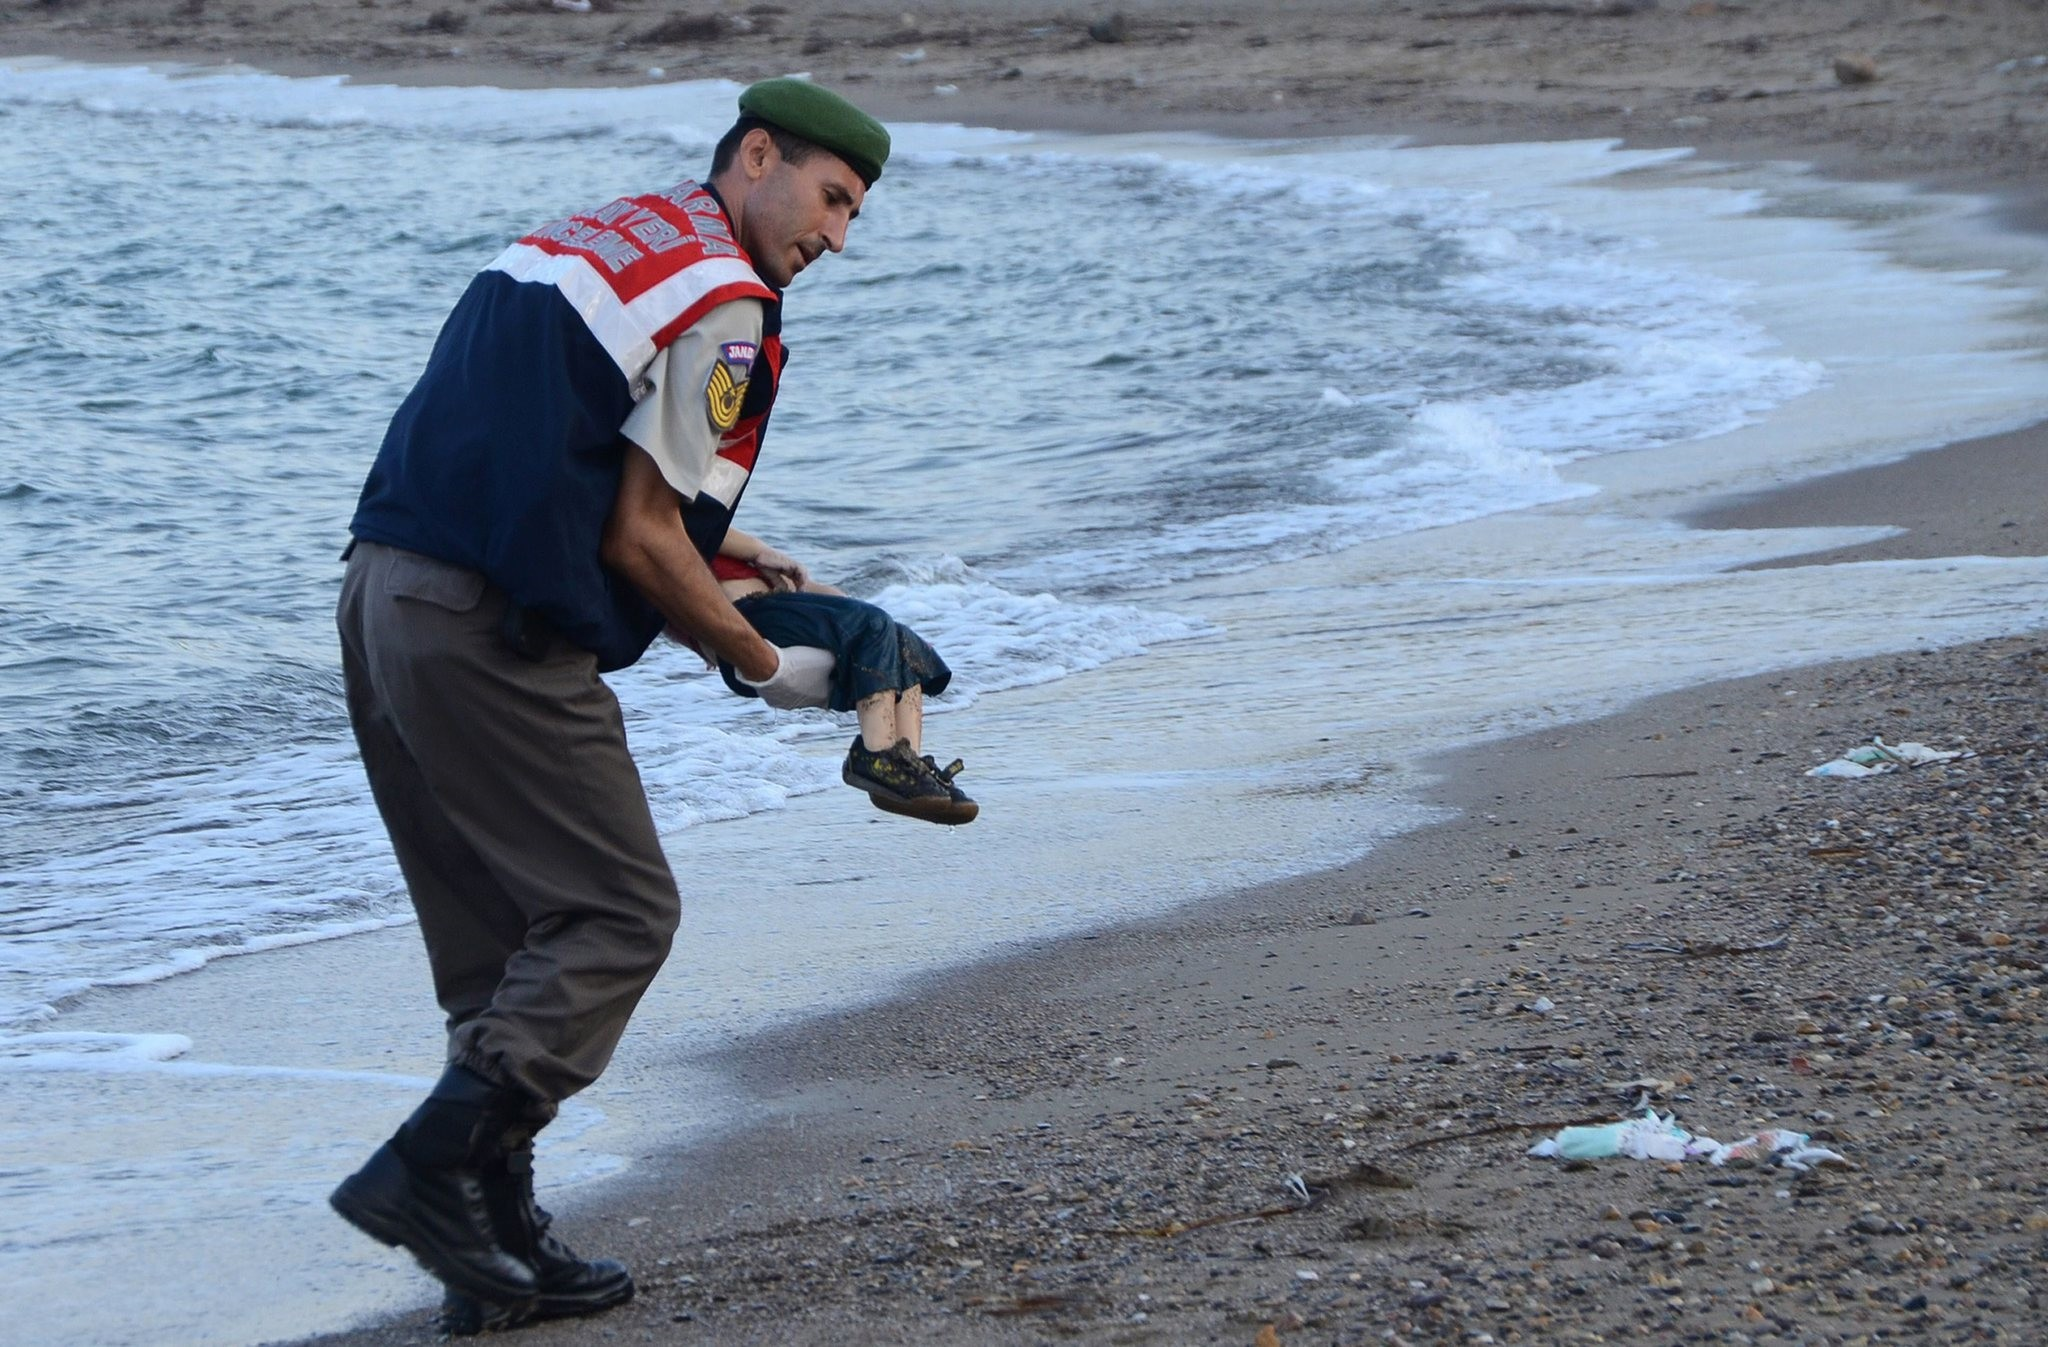 A gendarme  officer carries the dead body of Alan Kurdi on Sept.2, 2015.